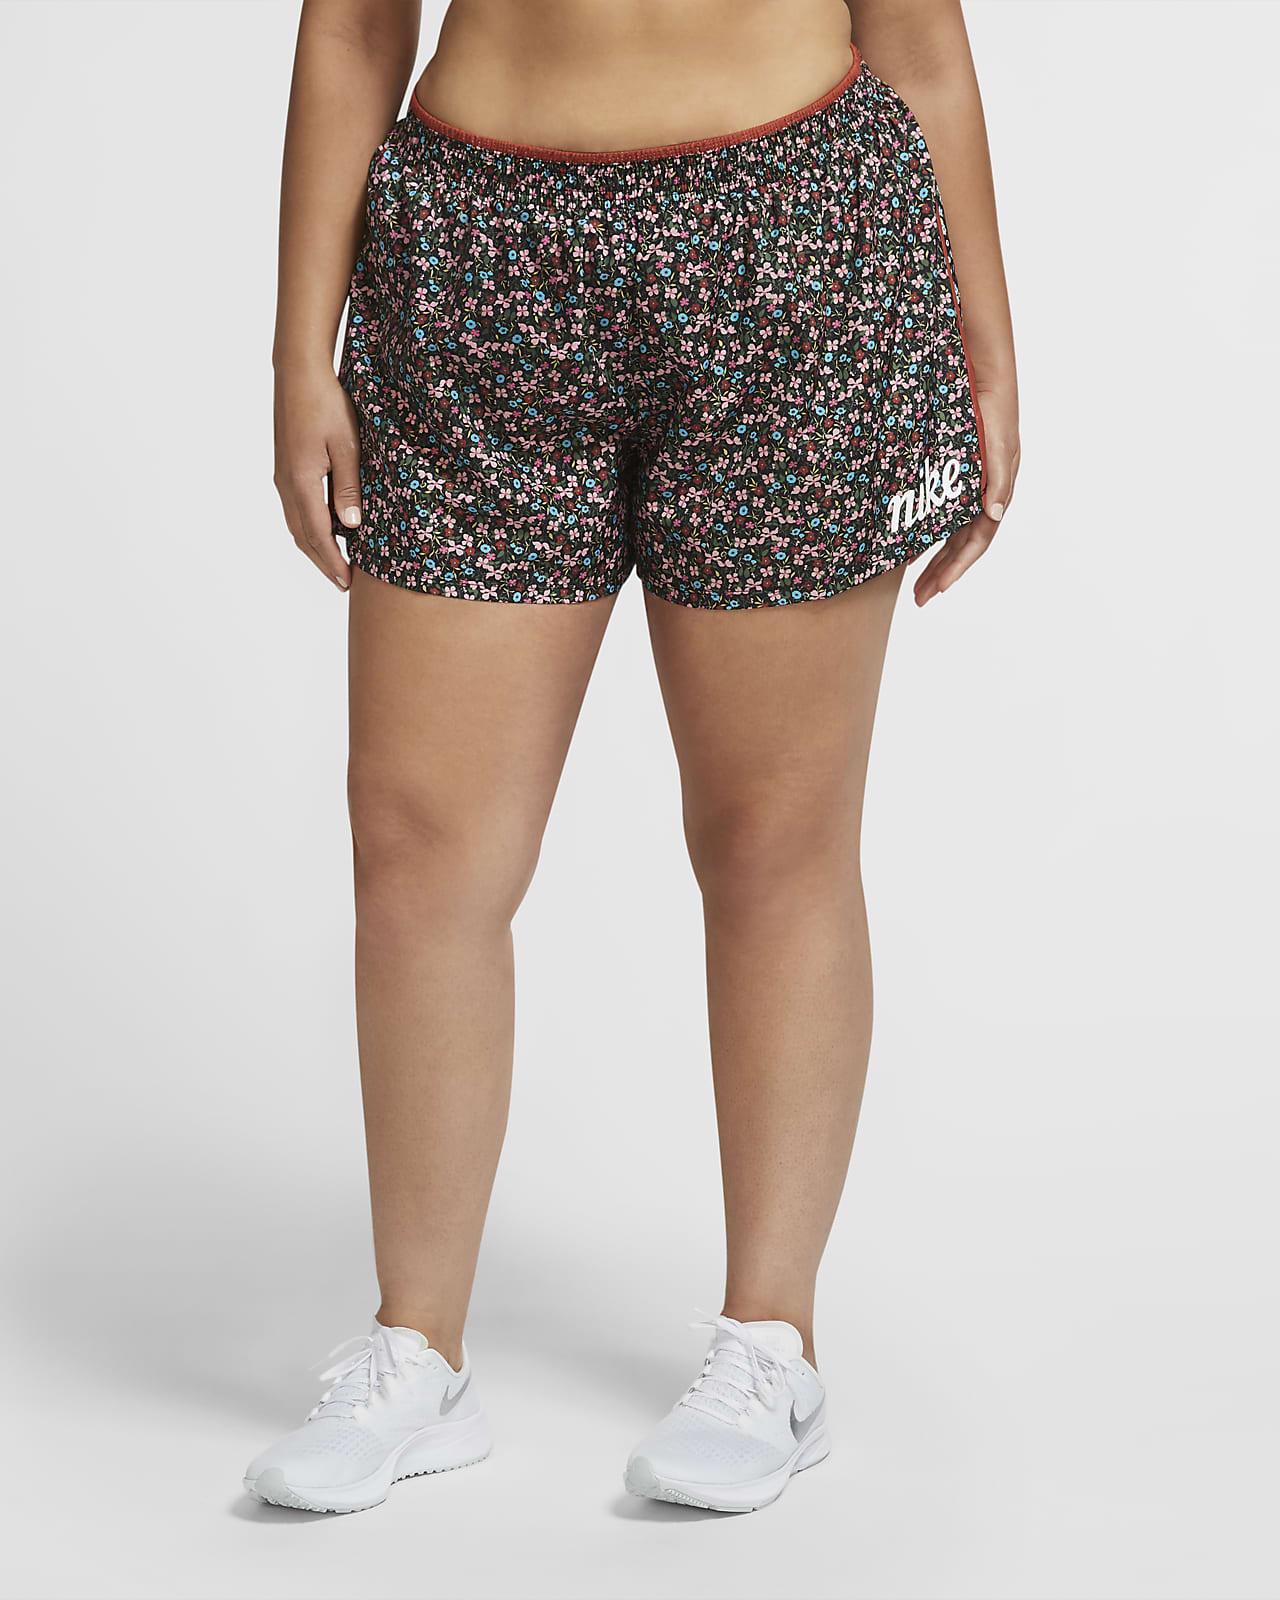 Nike 10K Femme Women's Running Shorts (Plus Size)